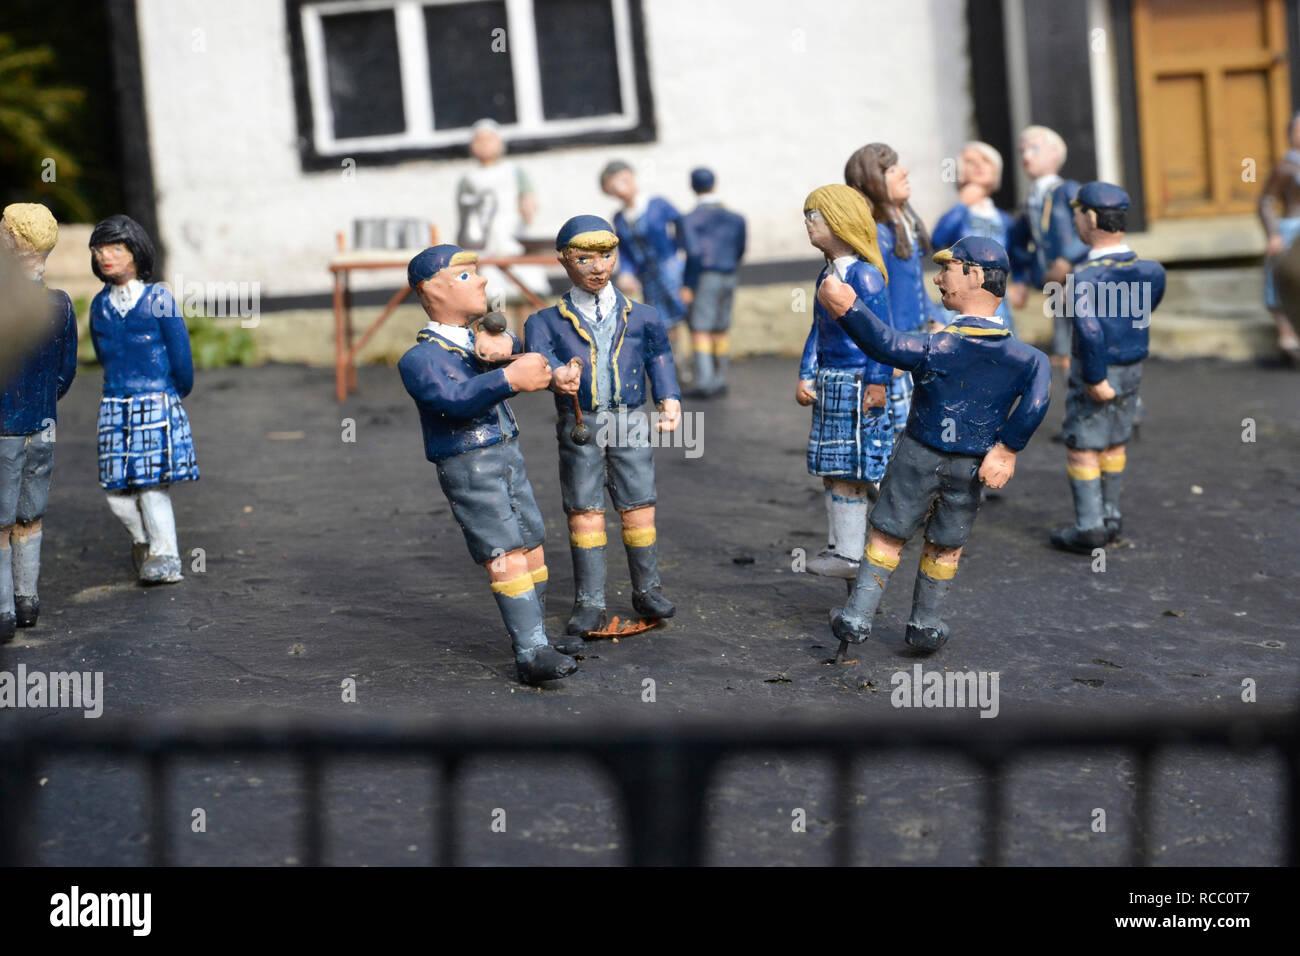 School children over the school gate at Beaconscot Model Village, Beaconsfield, Buckinghamshire, UK - Stock Image